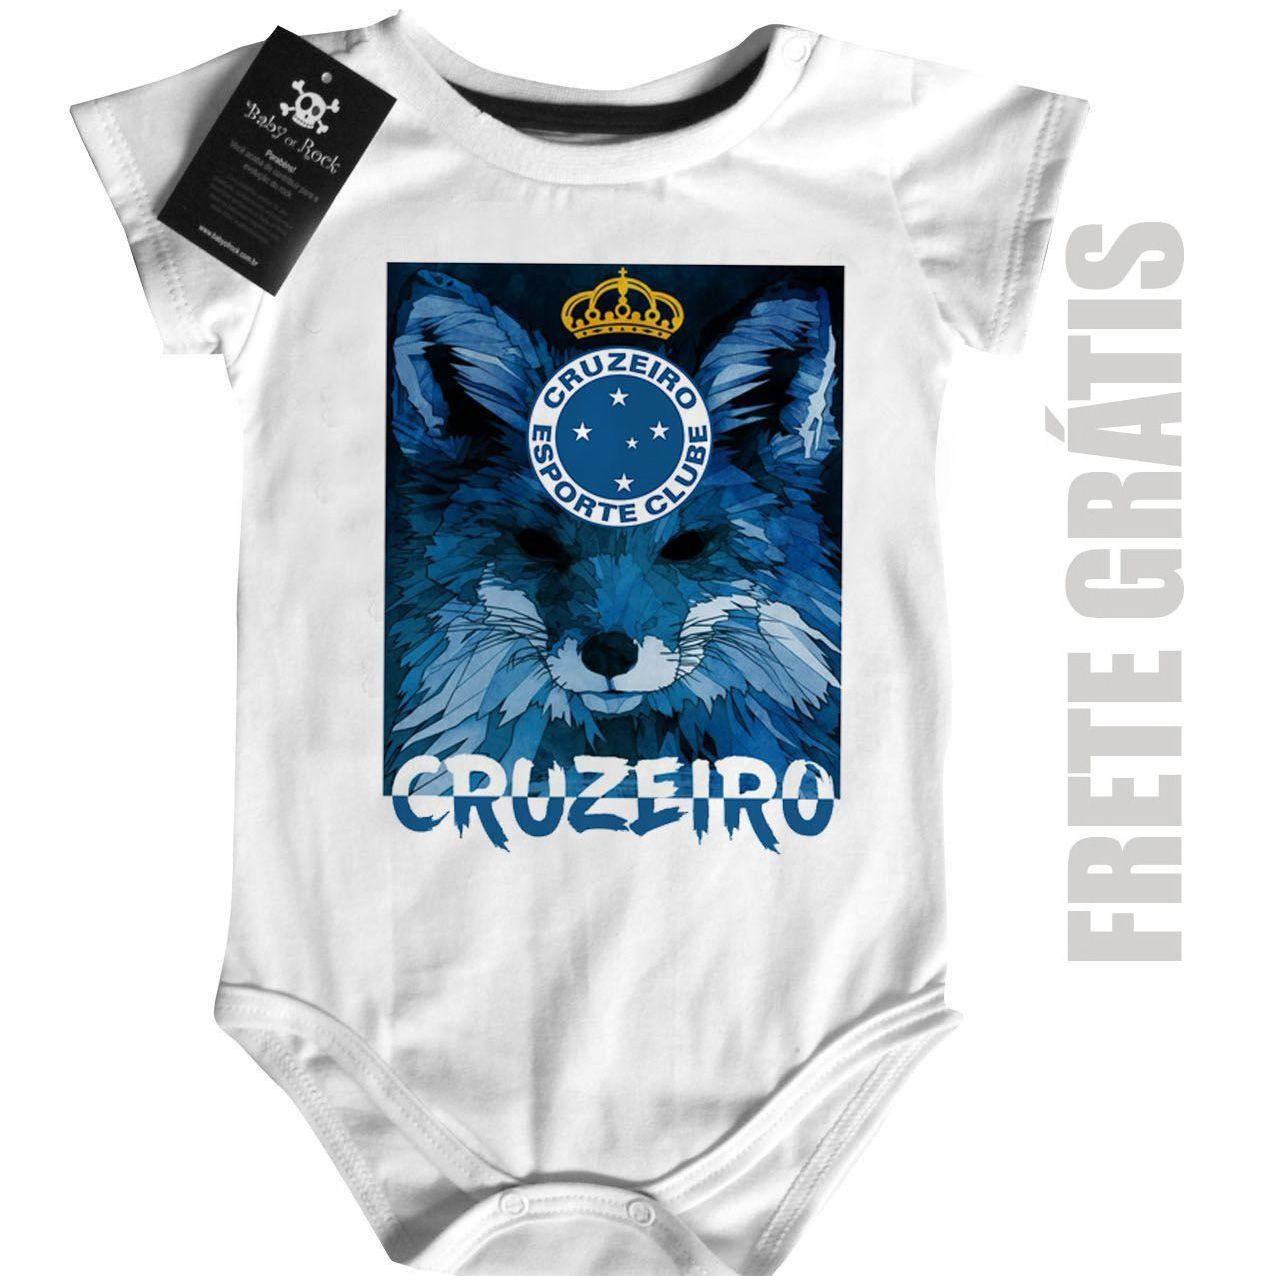 Body Bebe de Cruzeiro  Time-  Futebol - White  - Baby Monster - Body Bebe